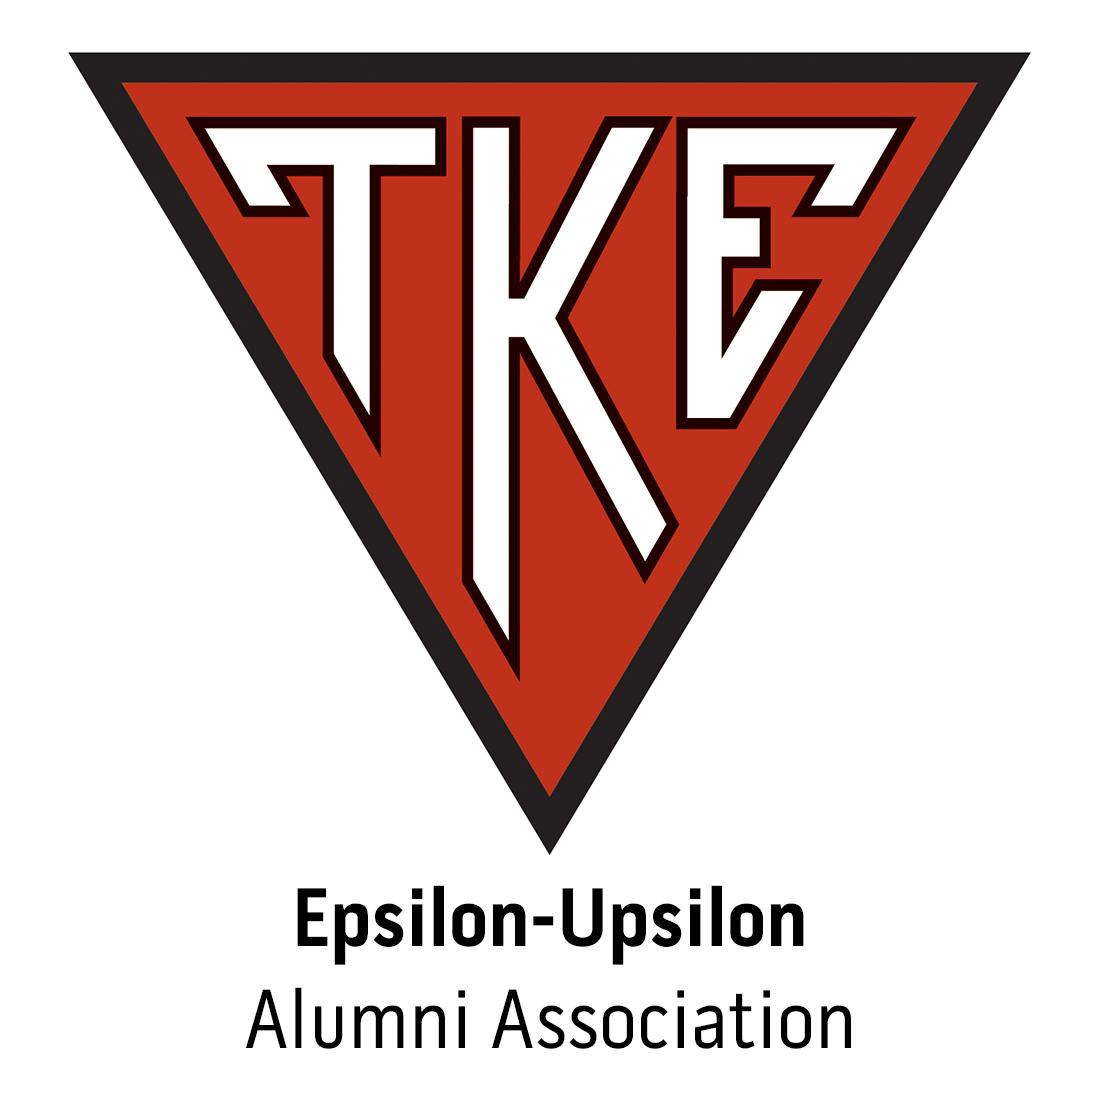 Epsilon-Upsilon Alumni Association for Northwestern State University